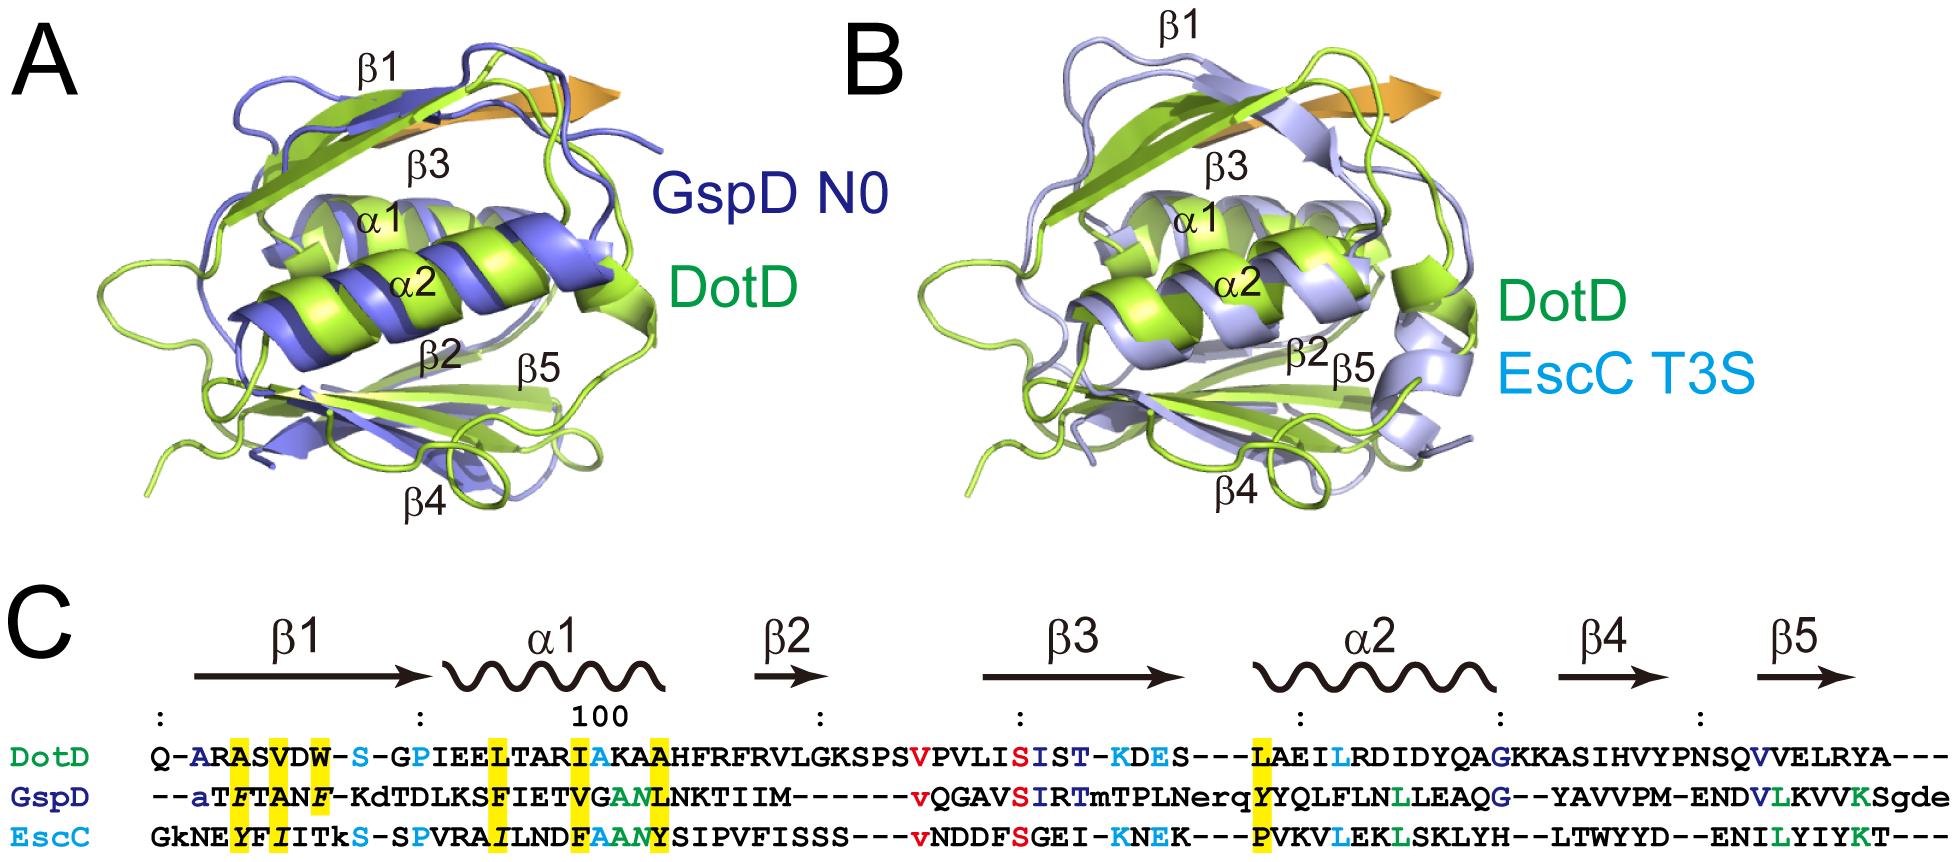 Comparison of DotDΔN with secretin periplasmic subdomains.